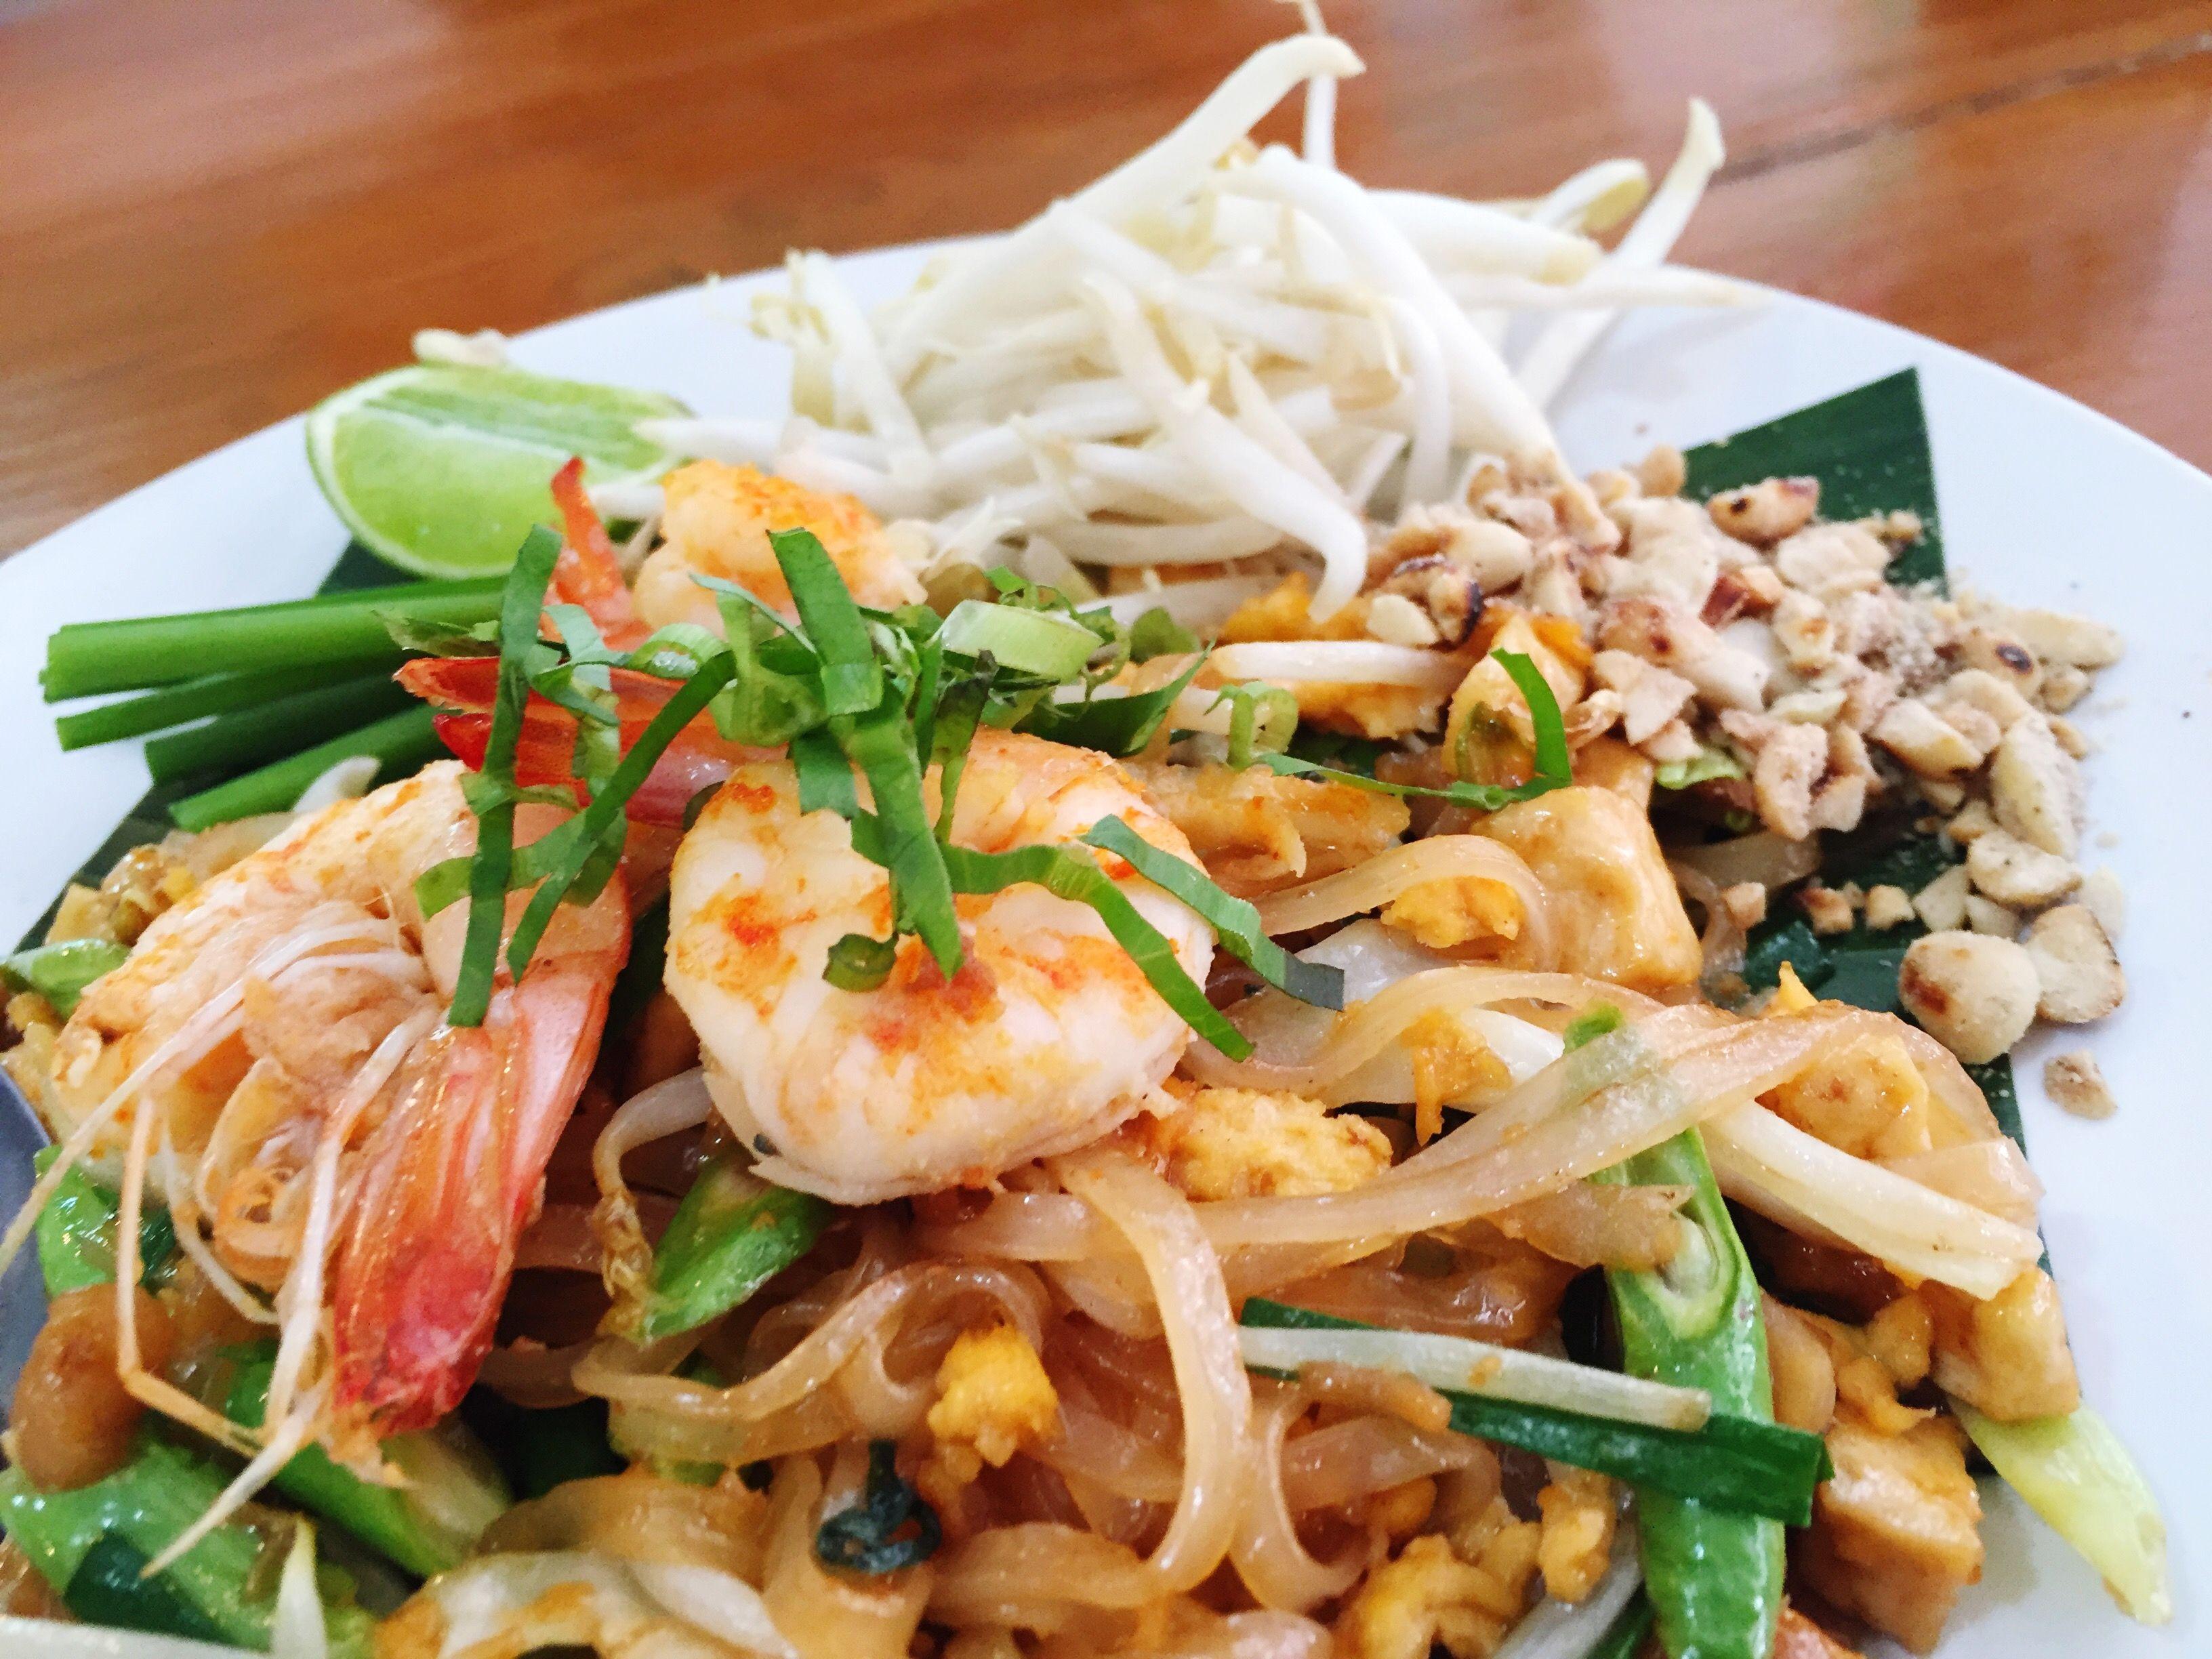 Gluten Free Pad Thai Recipe  Gluten Free Pad Thai Recipe is the Best Ever